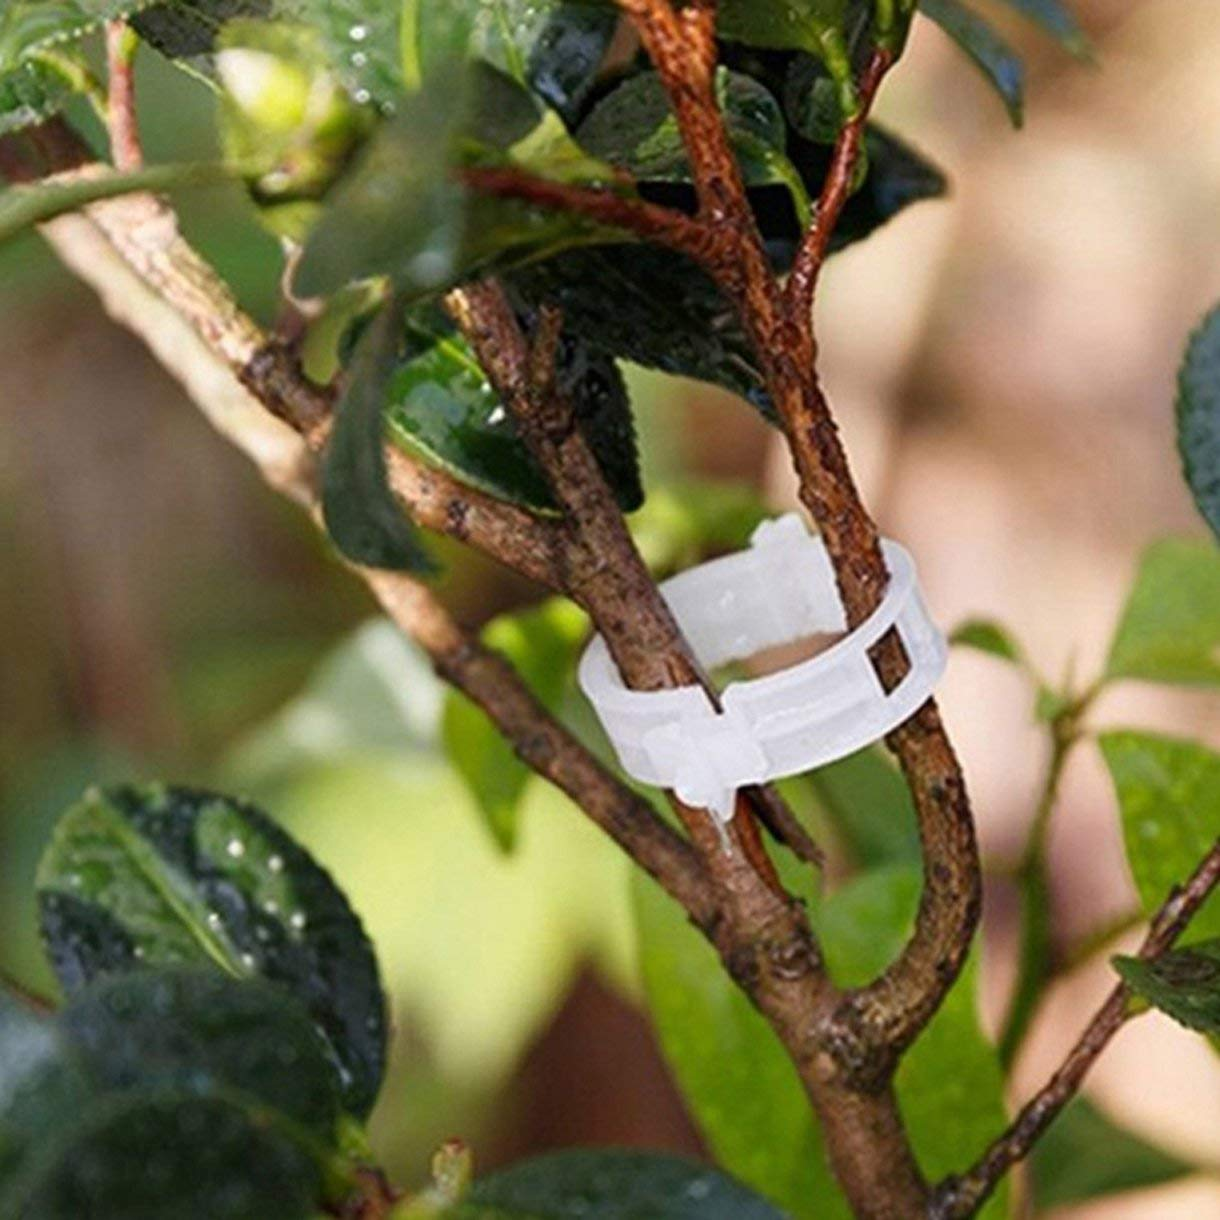 Set Vine Tomate v/ástago Clip de fijaci/ón de Verduras【K】 fengz Clips de pl/ástico Soporte de Plantas 50PCS